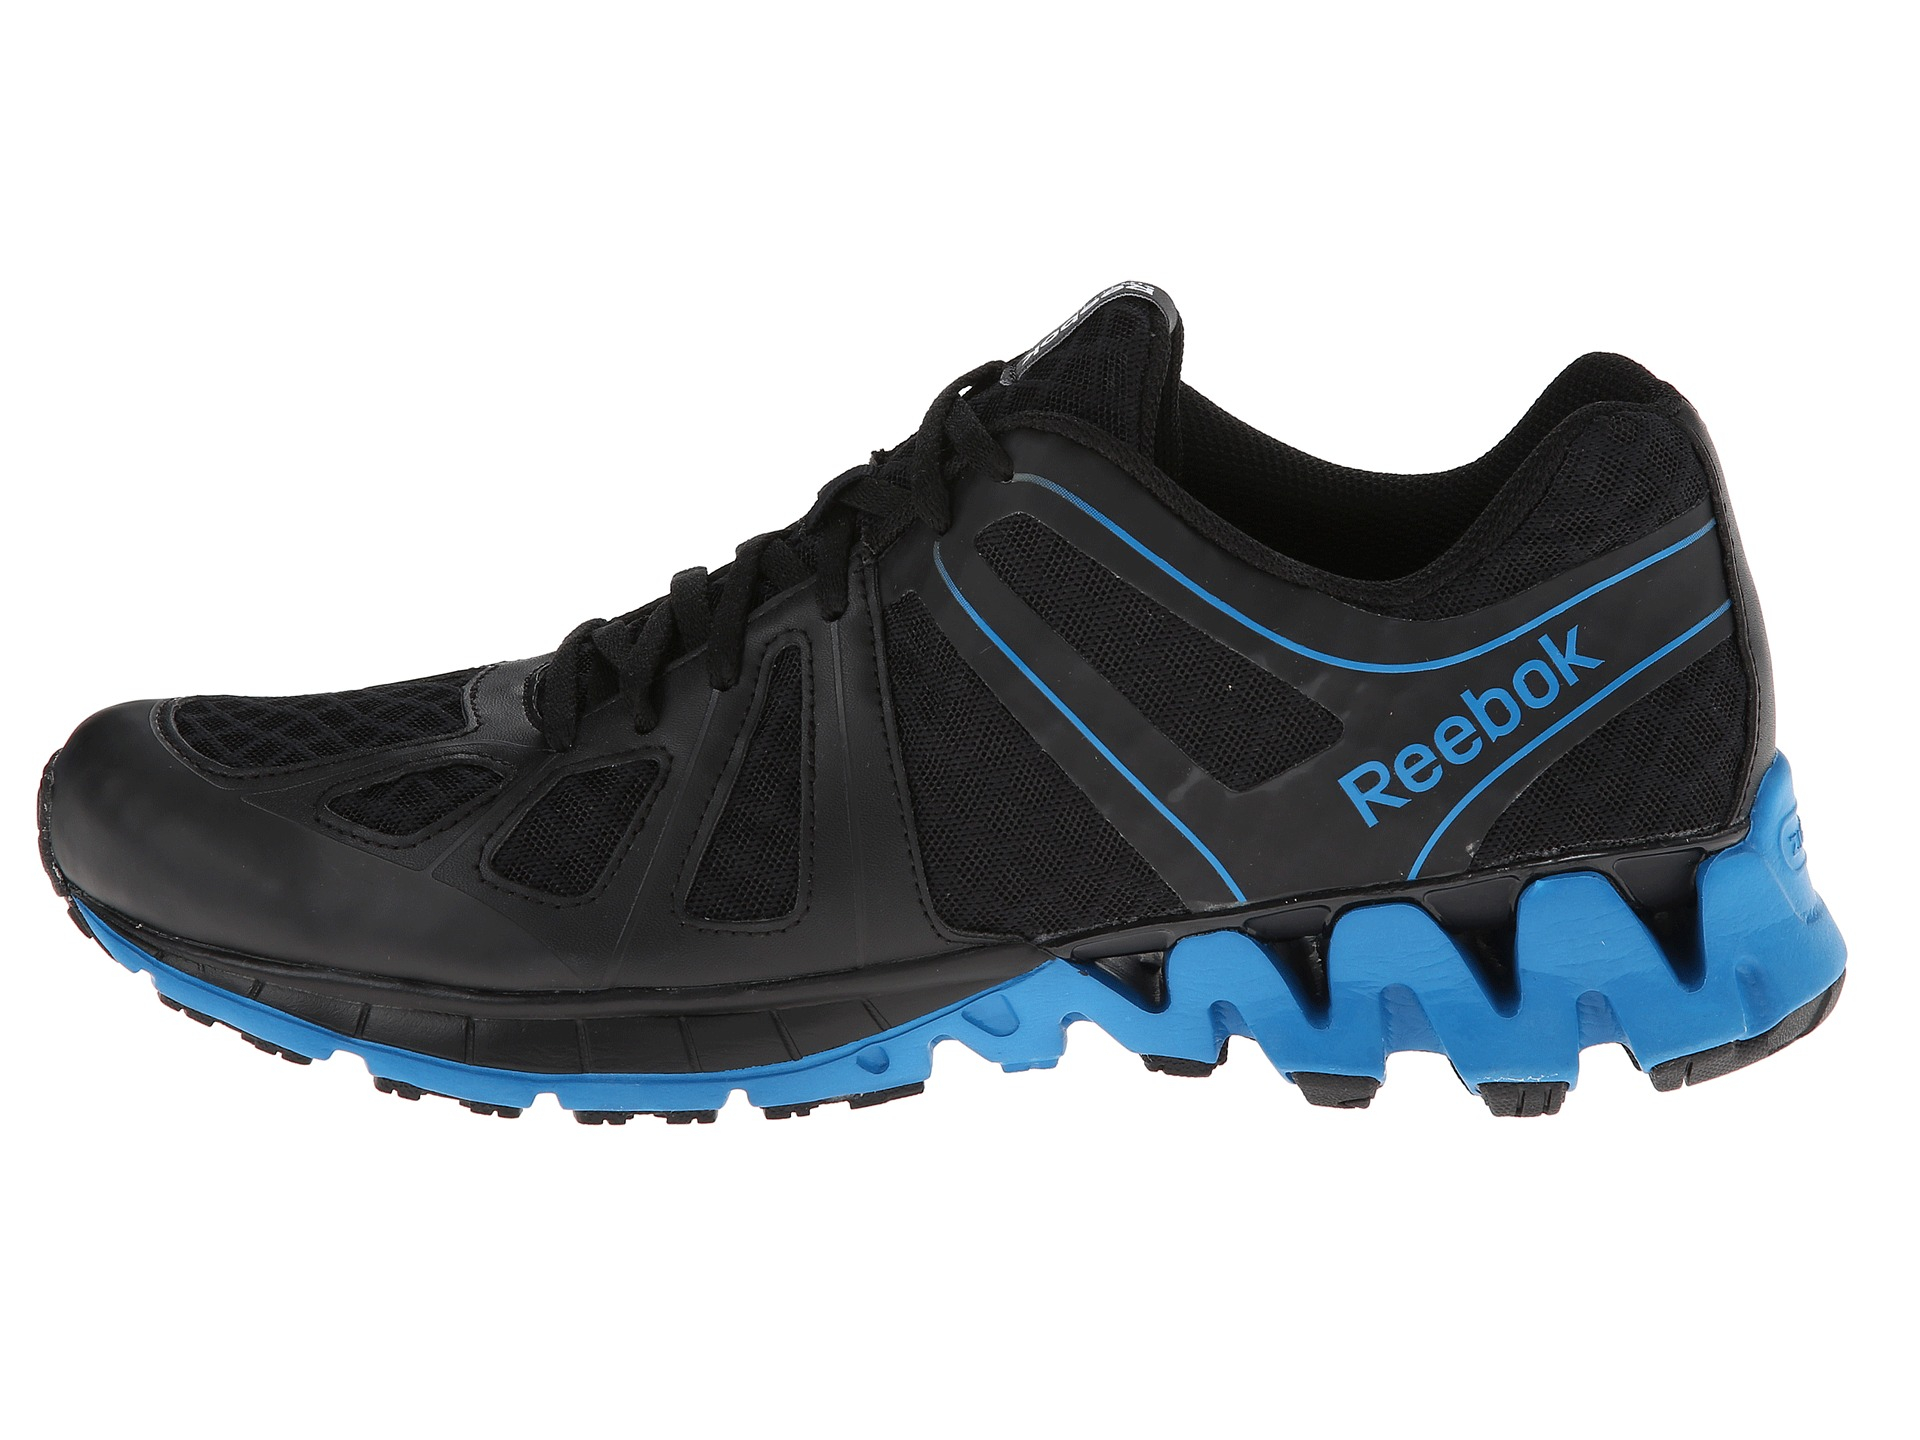 Reebok Trail Warrior Running Sneaker In Black For Men Lyst